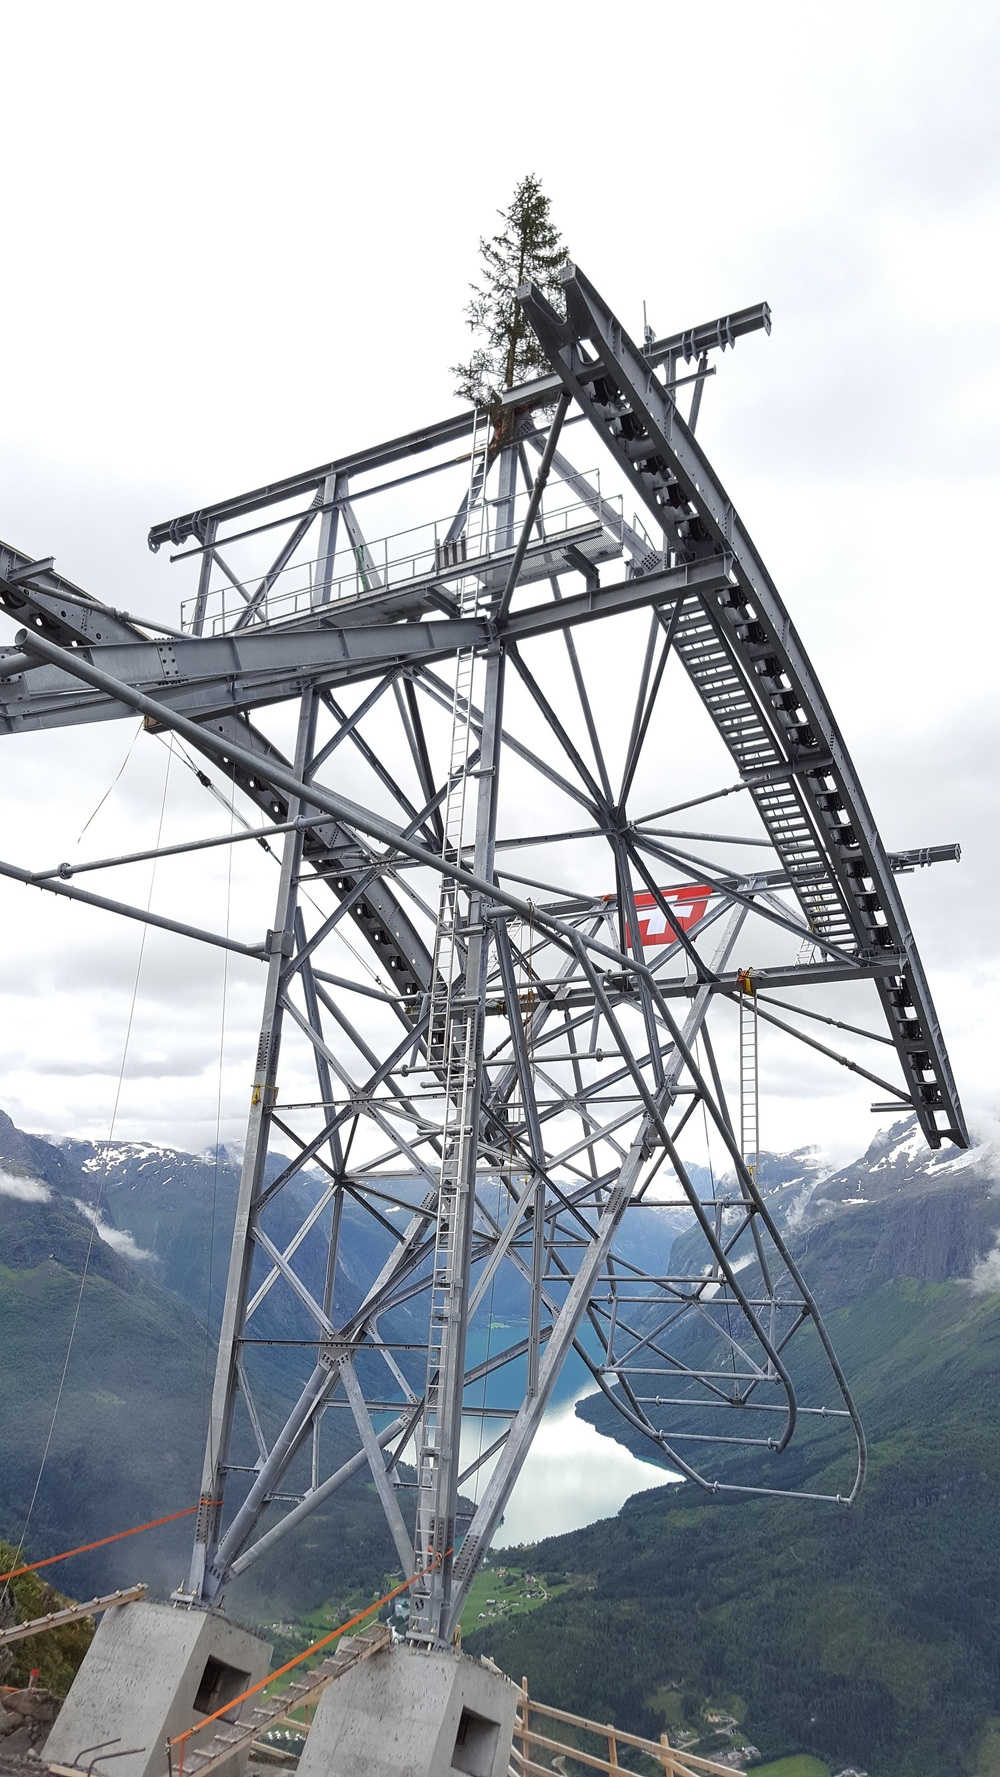 Grana og flagget markerer ferdigstilling av toppmasta på Hoven (1011 m.o.h.)